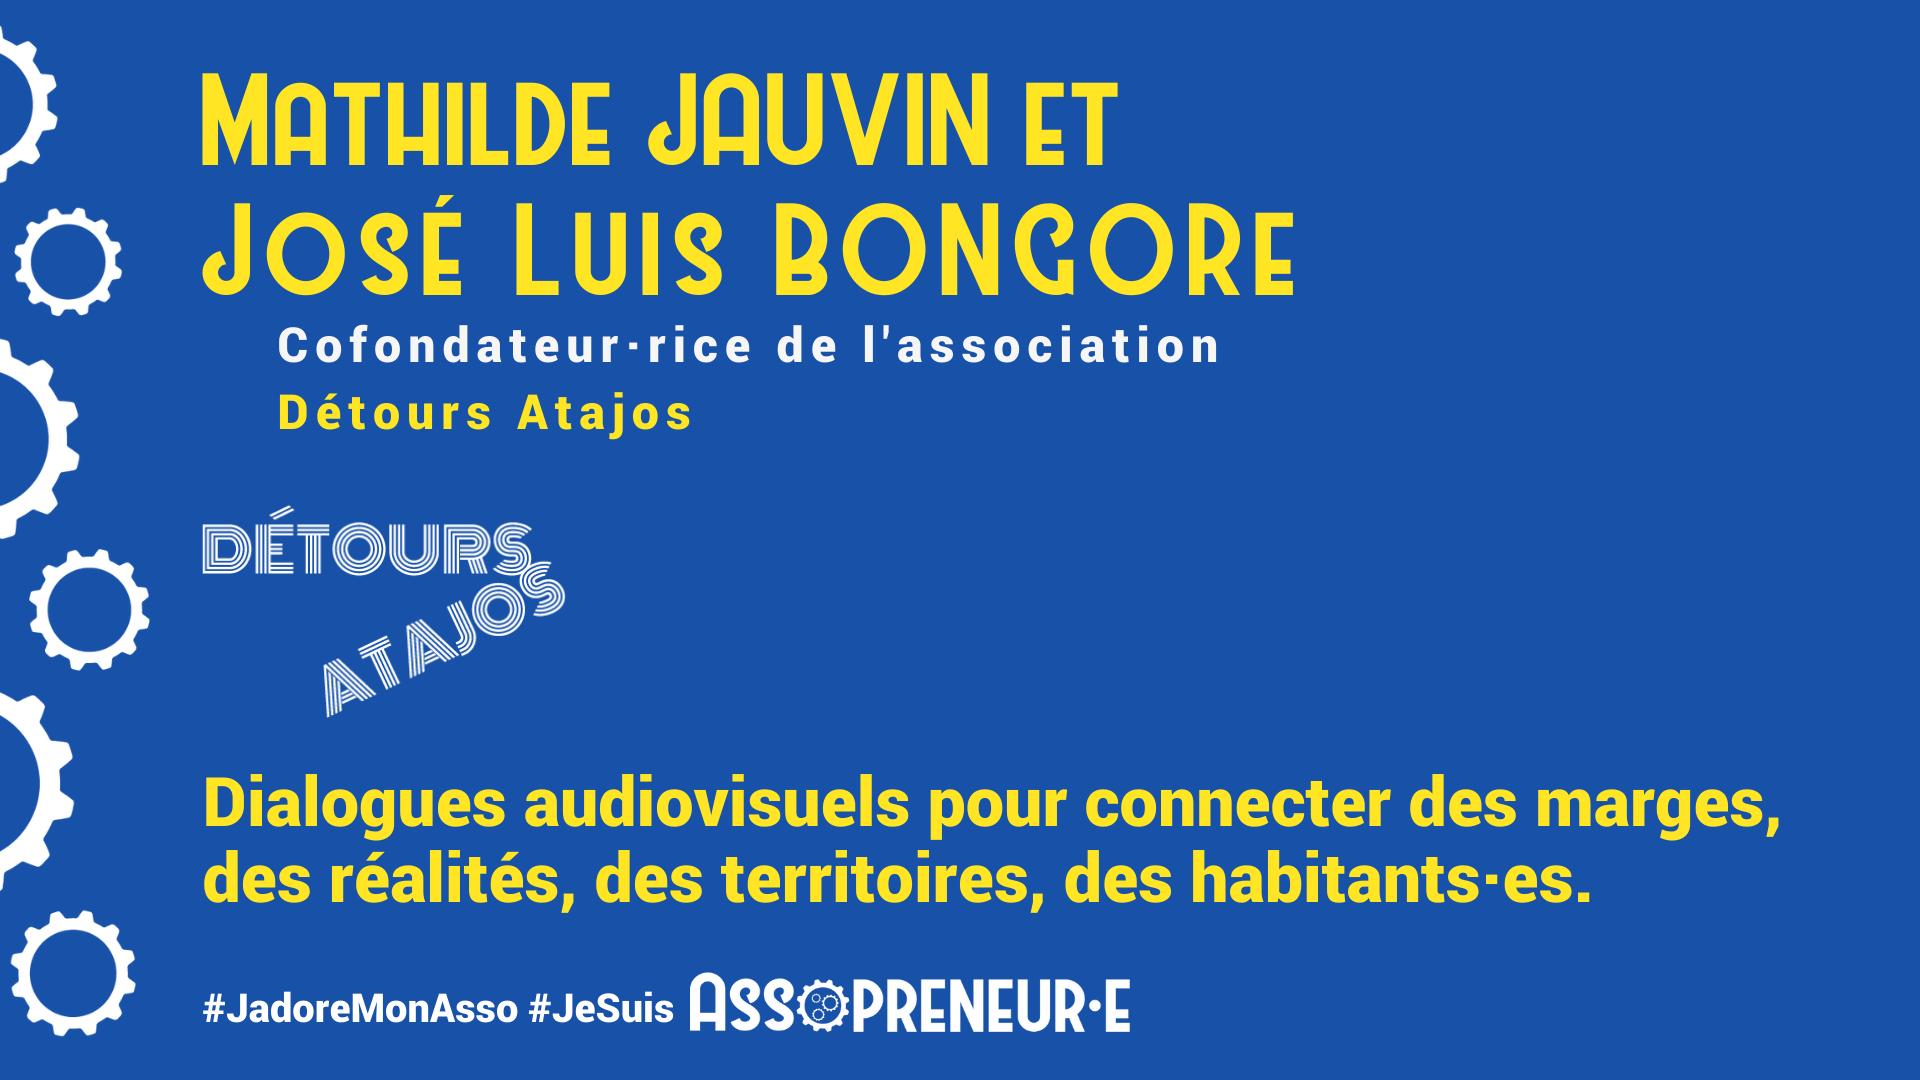 Mathilde JAUVIN et JoseLuis BONGORE membres programme Assopreneur